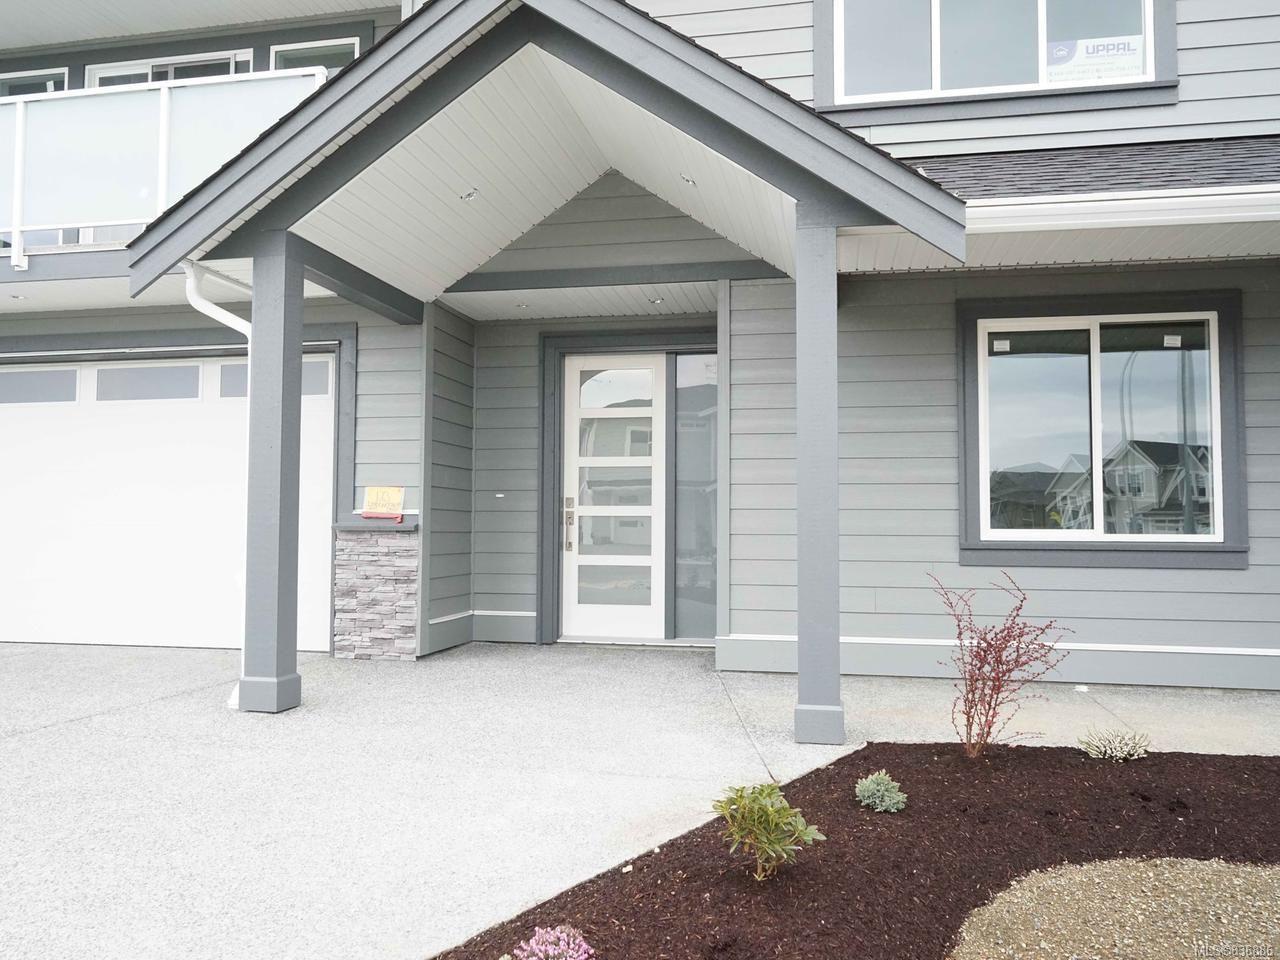 Photo 12: Photos: 123 Lindquist Rd in NANAIMO: Na North Nanaimo House for sale (Nanaimo)  : MLS®# 836886